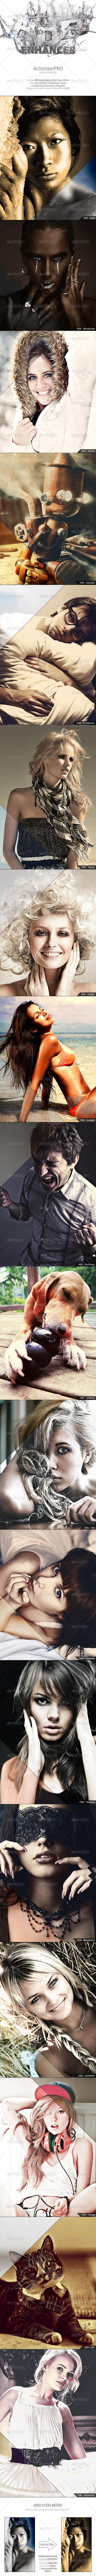 ActionizerPRO - HDR Enhancer Pack - Bundle - Photo Effects Actions